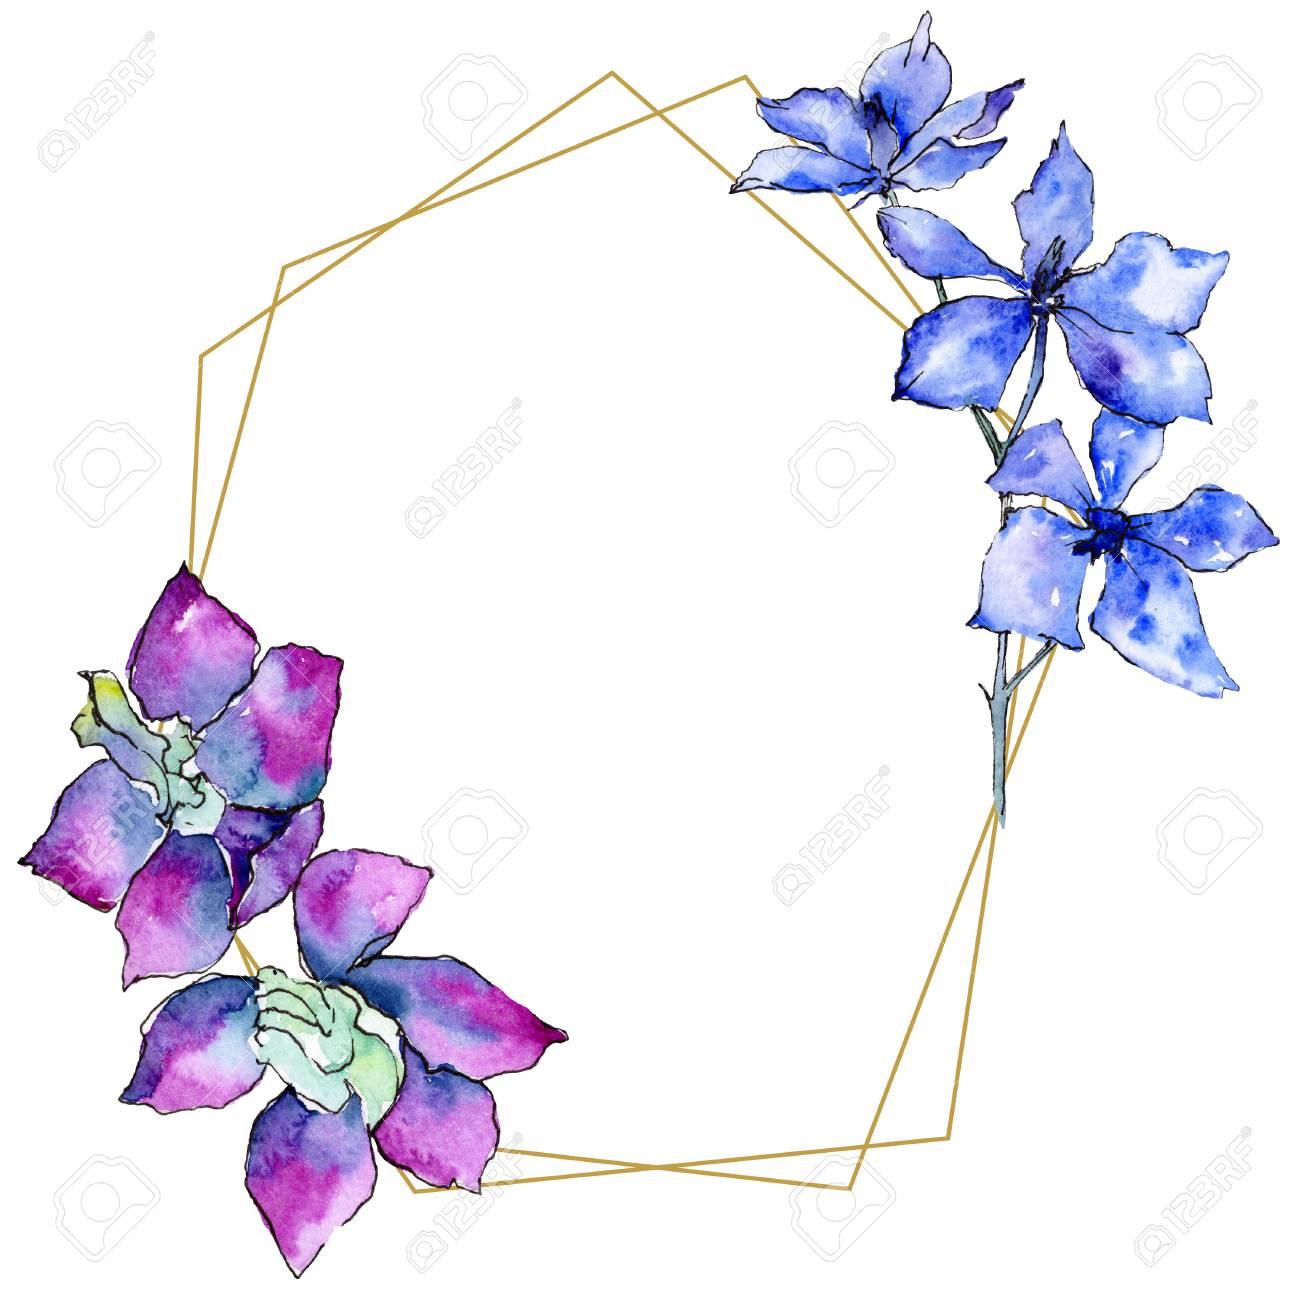 Purple Orchid Flower Floral Botanical Flower Watercolor